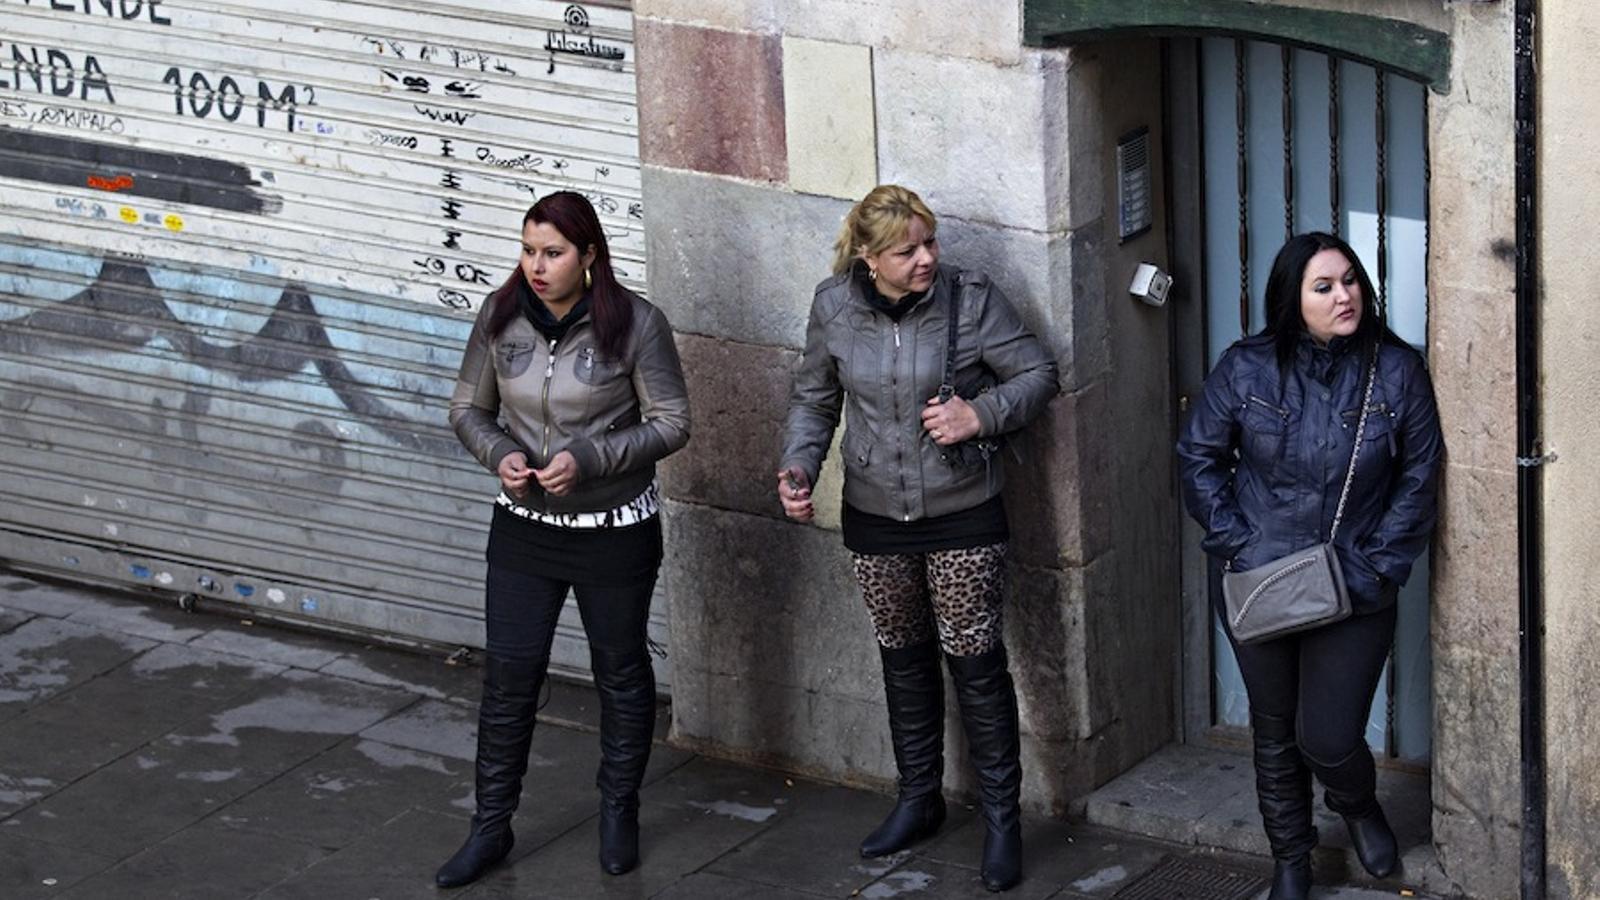 prostitutas camp nou prostitutas raval barcelona